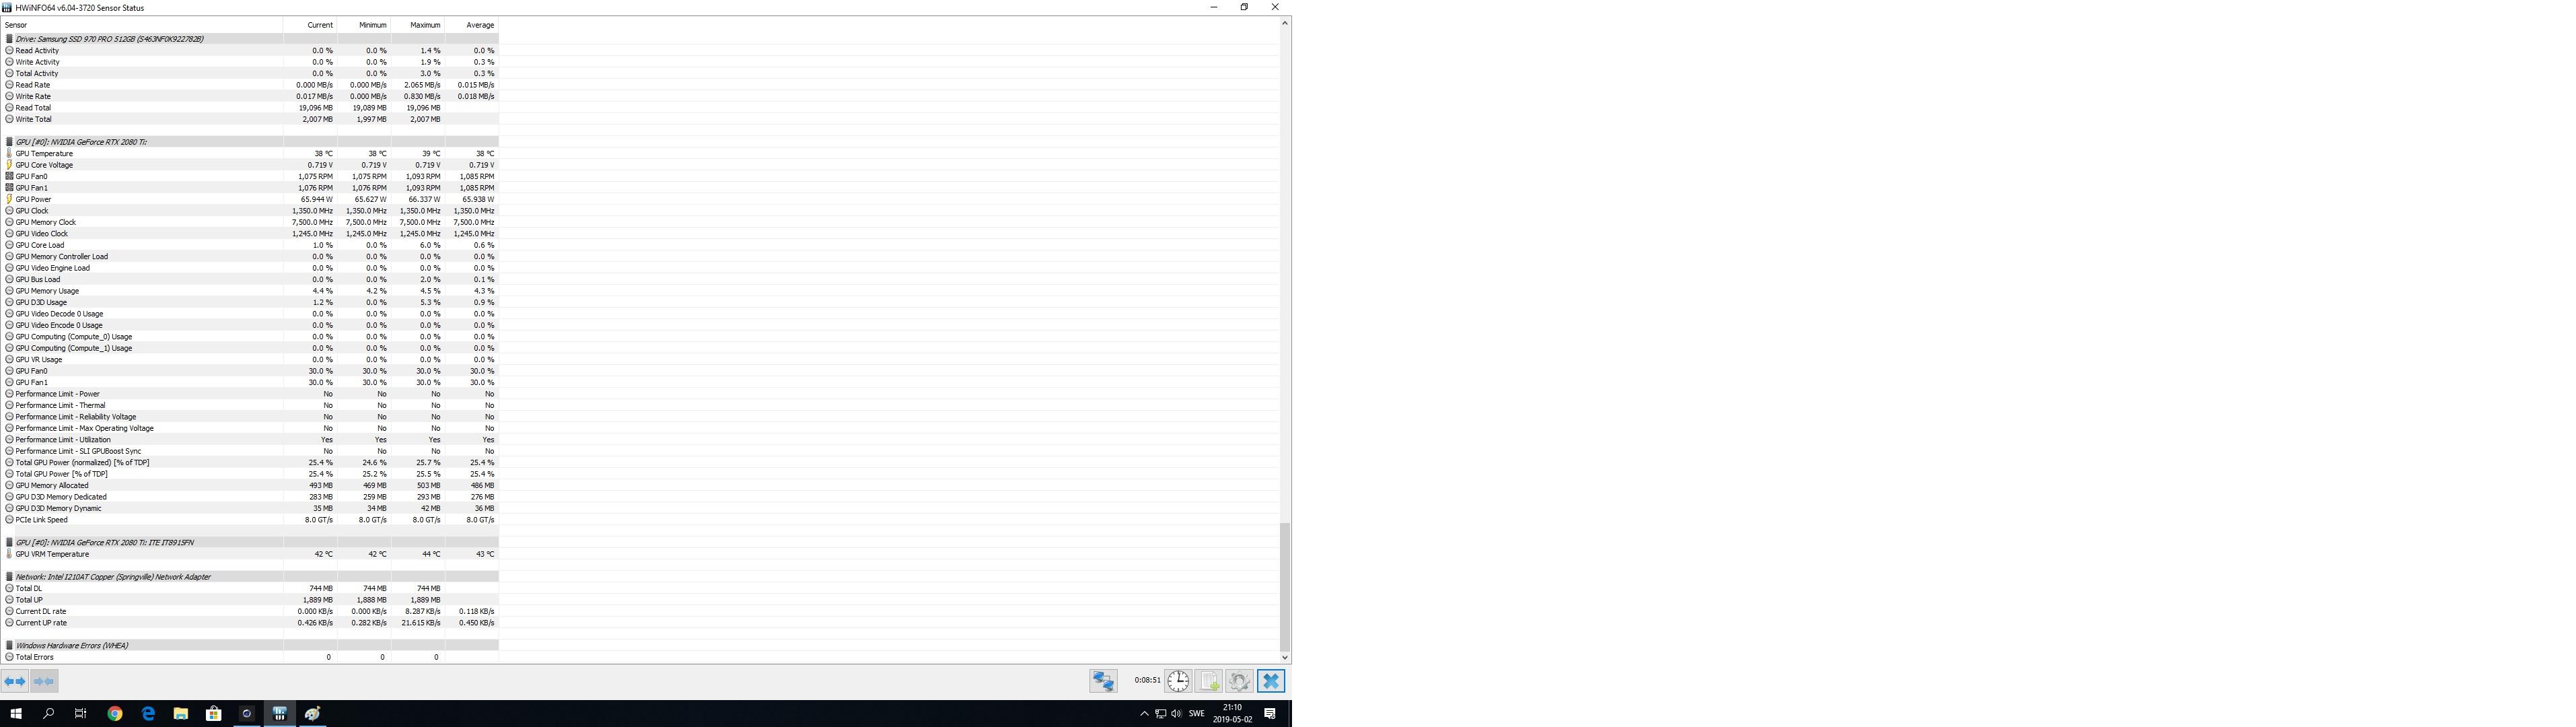 Apex Legends Crash no error - PC (apex_crash txt) - Page 15